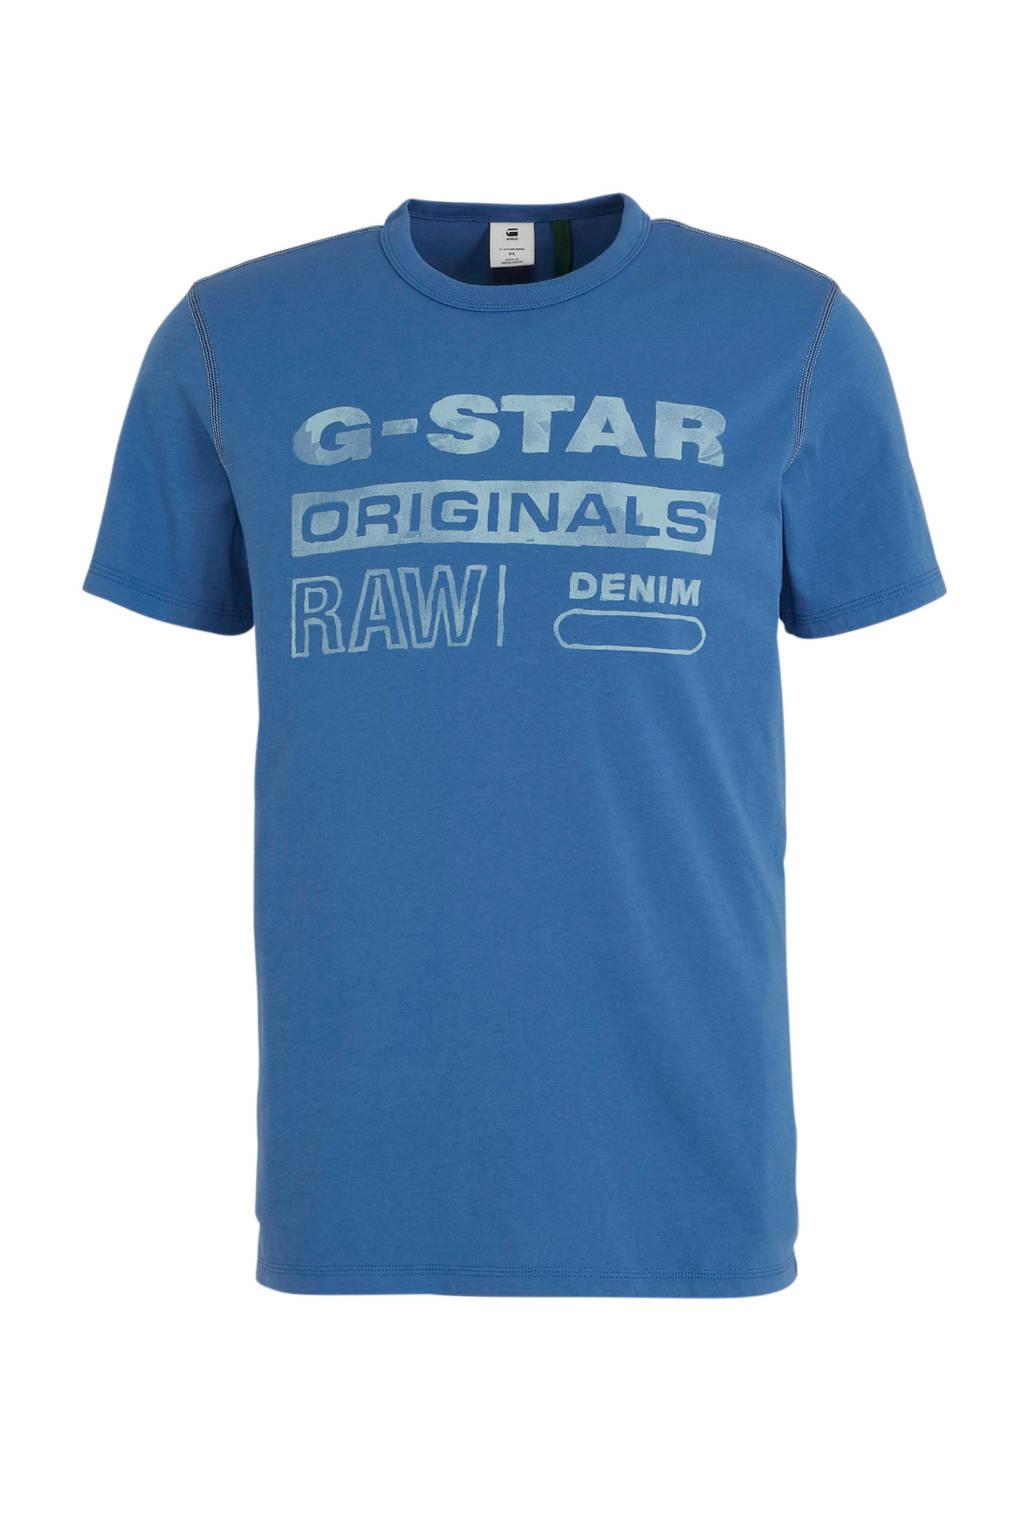 G-Star RAW T-shirt met logo blauw/wit, Blauw/wit